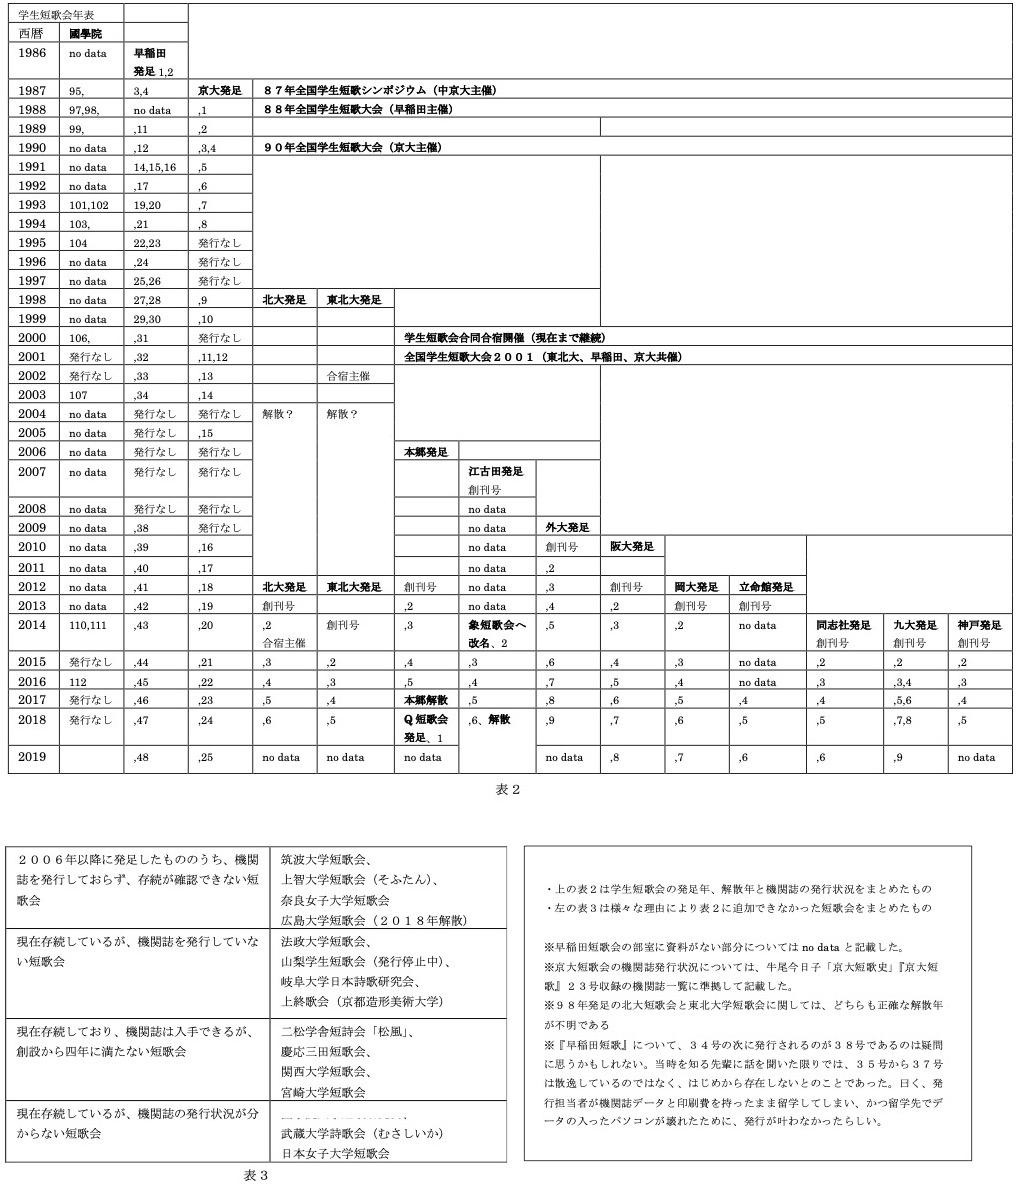 f:id:sanbashi:20191103100308j:plain